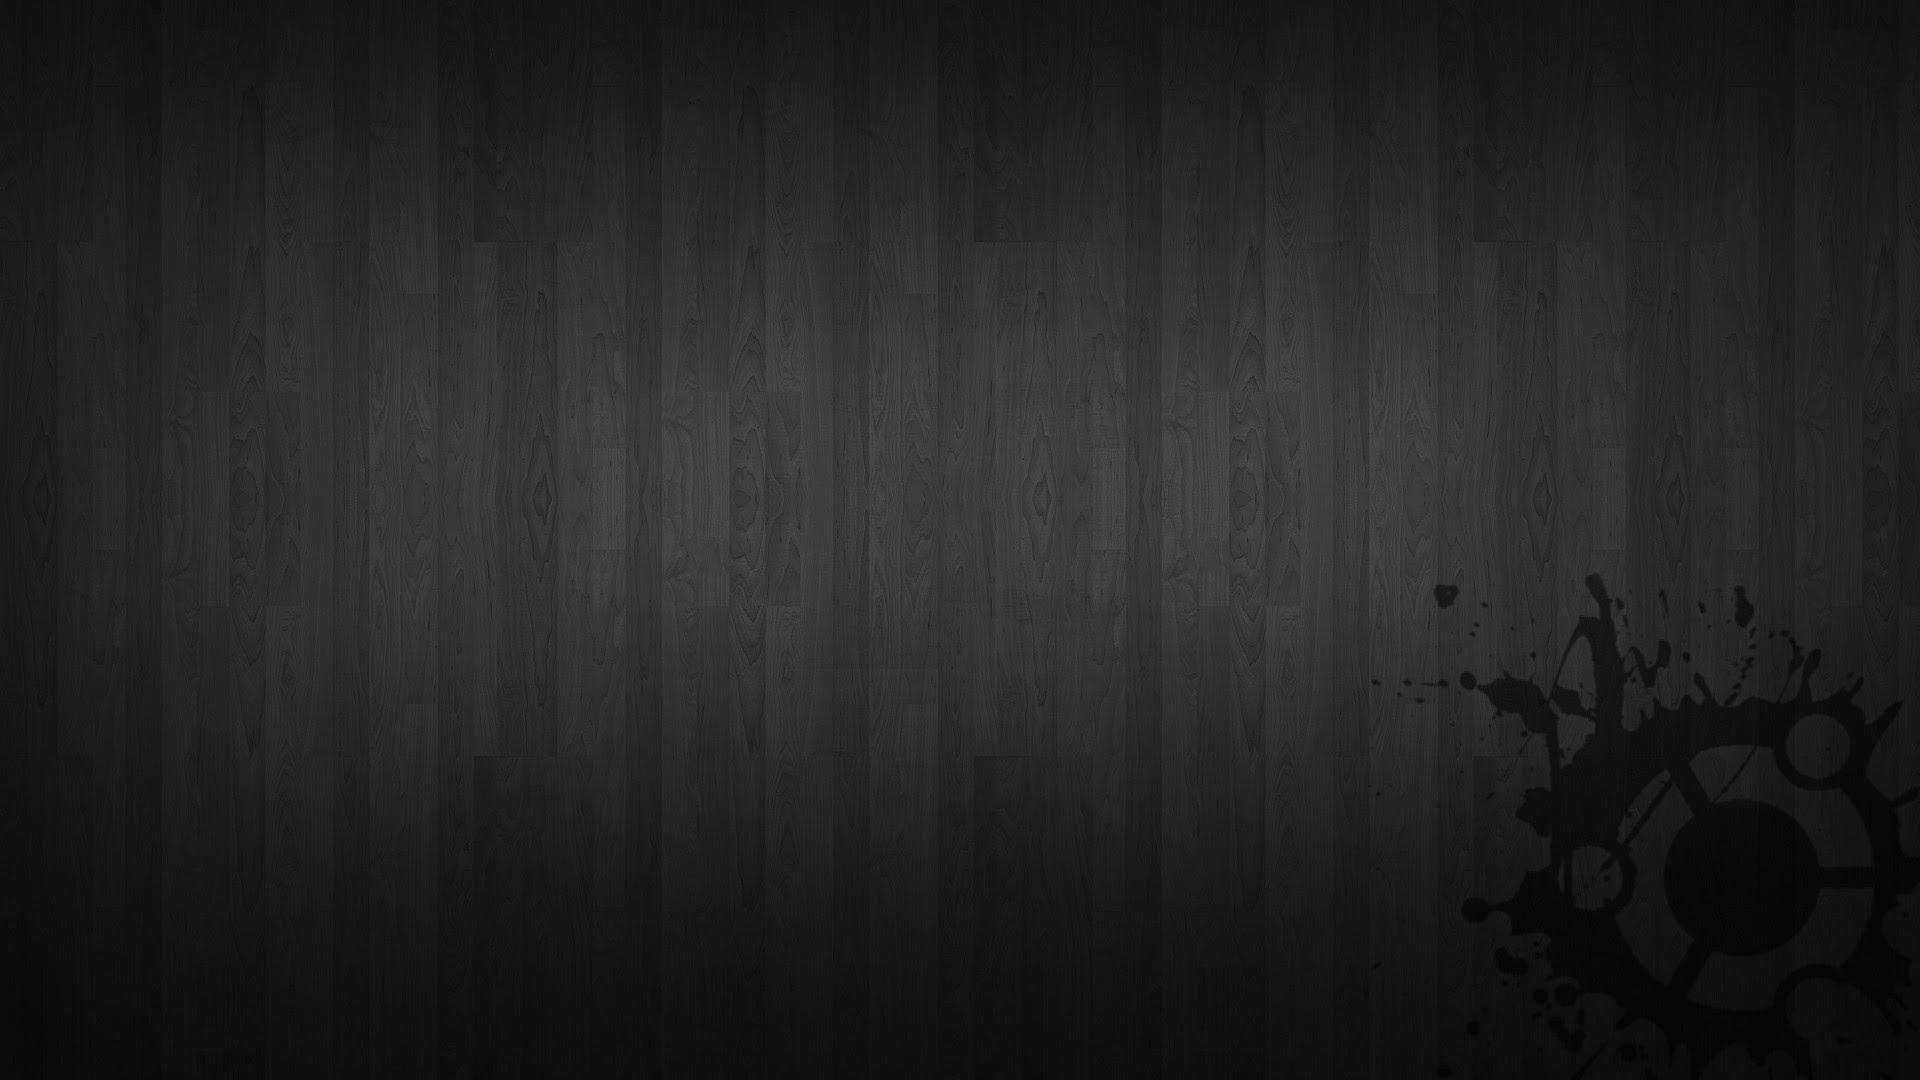 600 Wallpaper Black Linux HD Gratis